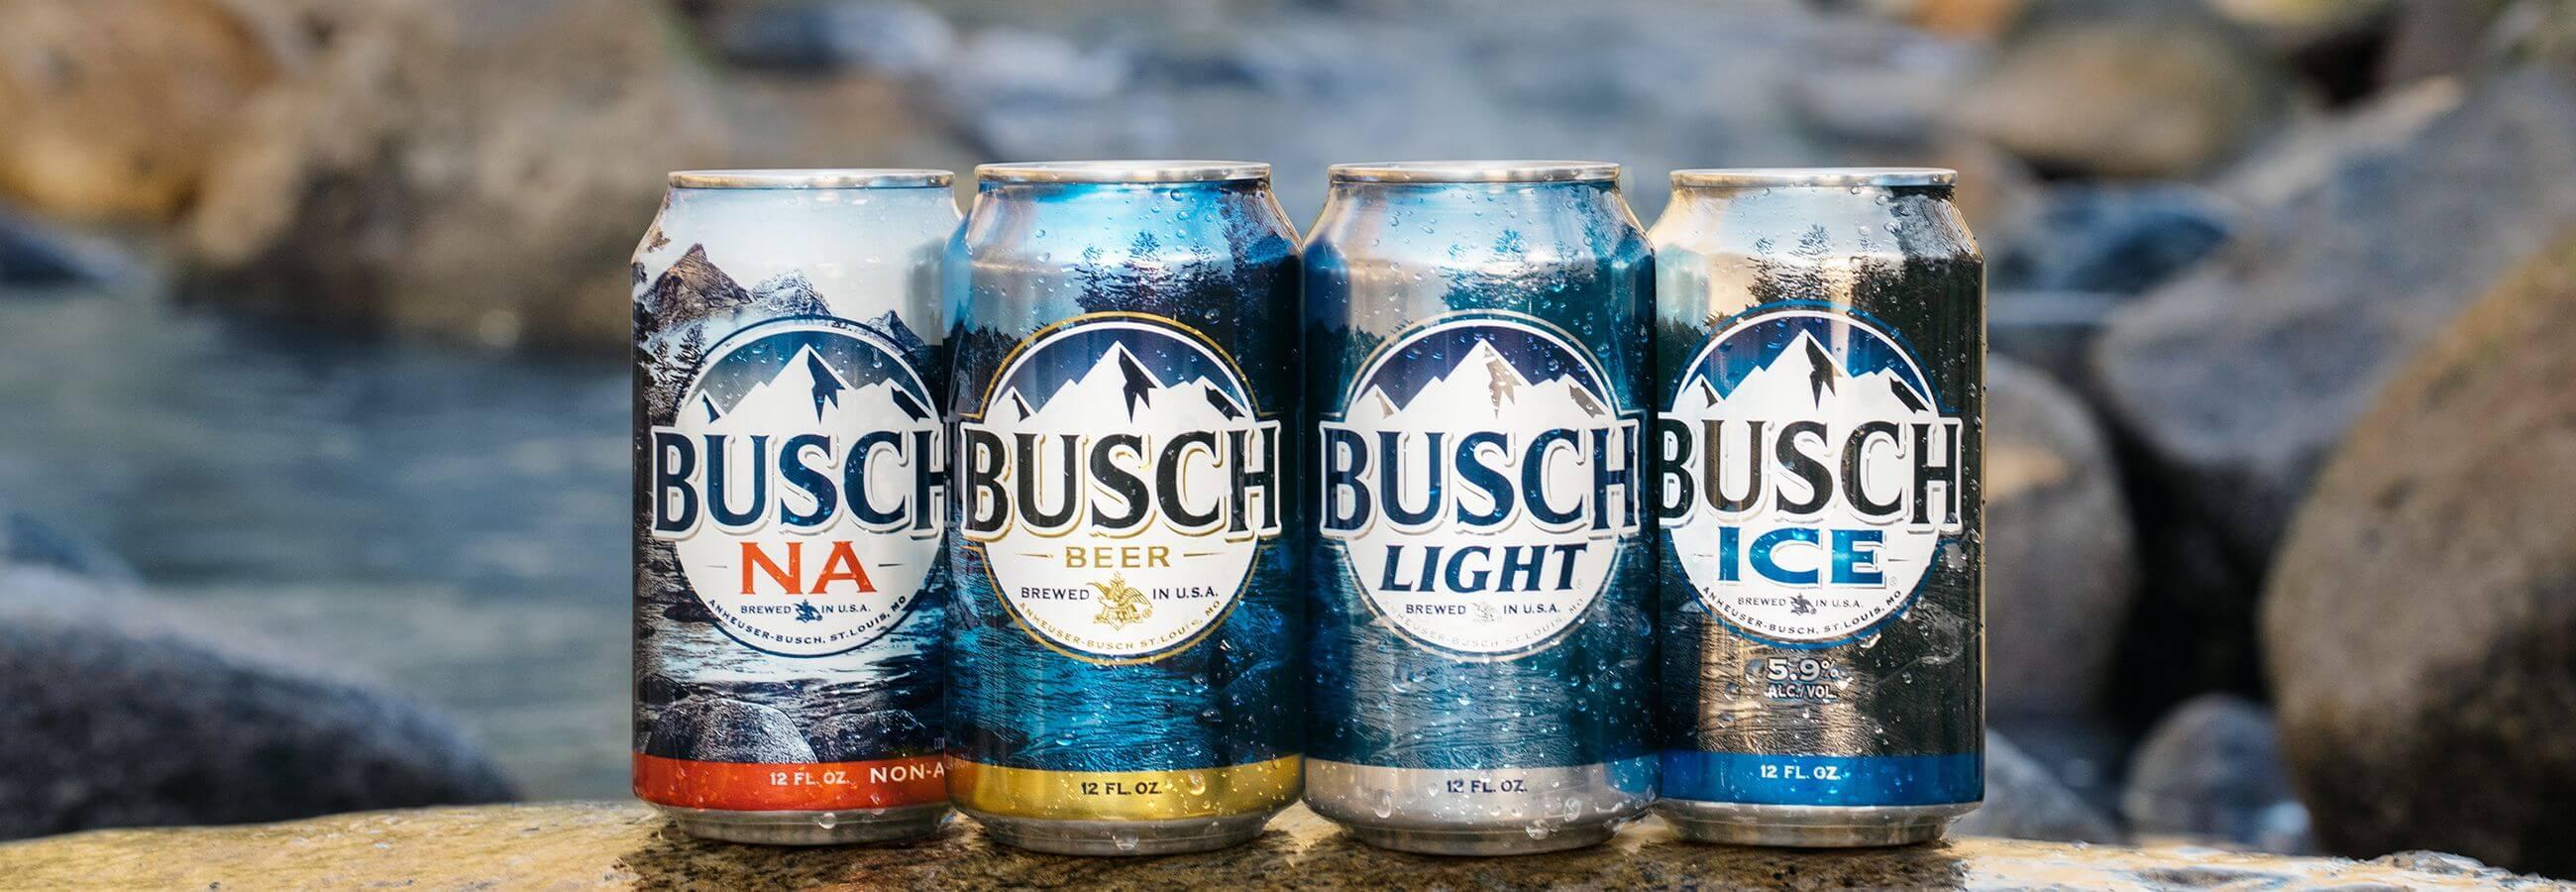 Busch Bucks All-Star Sweepstakes